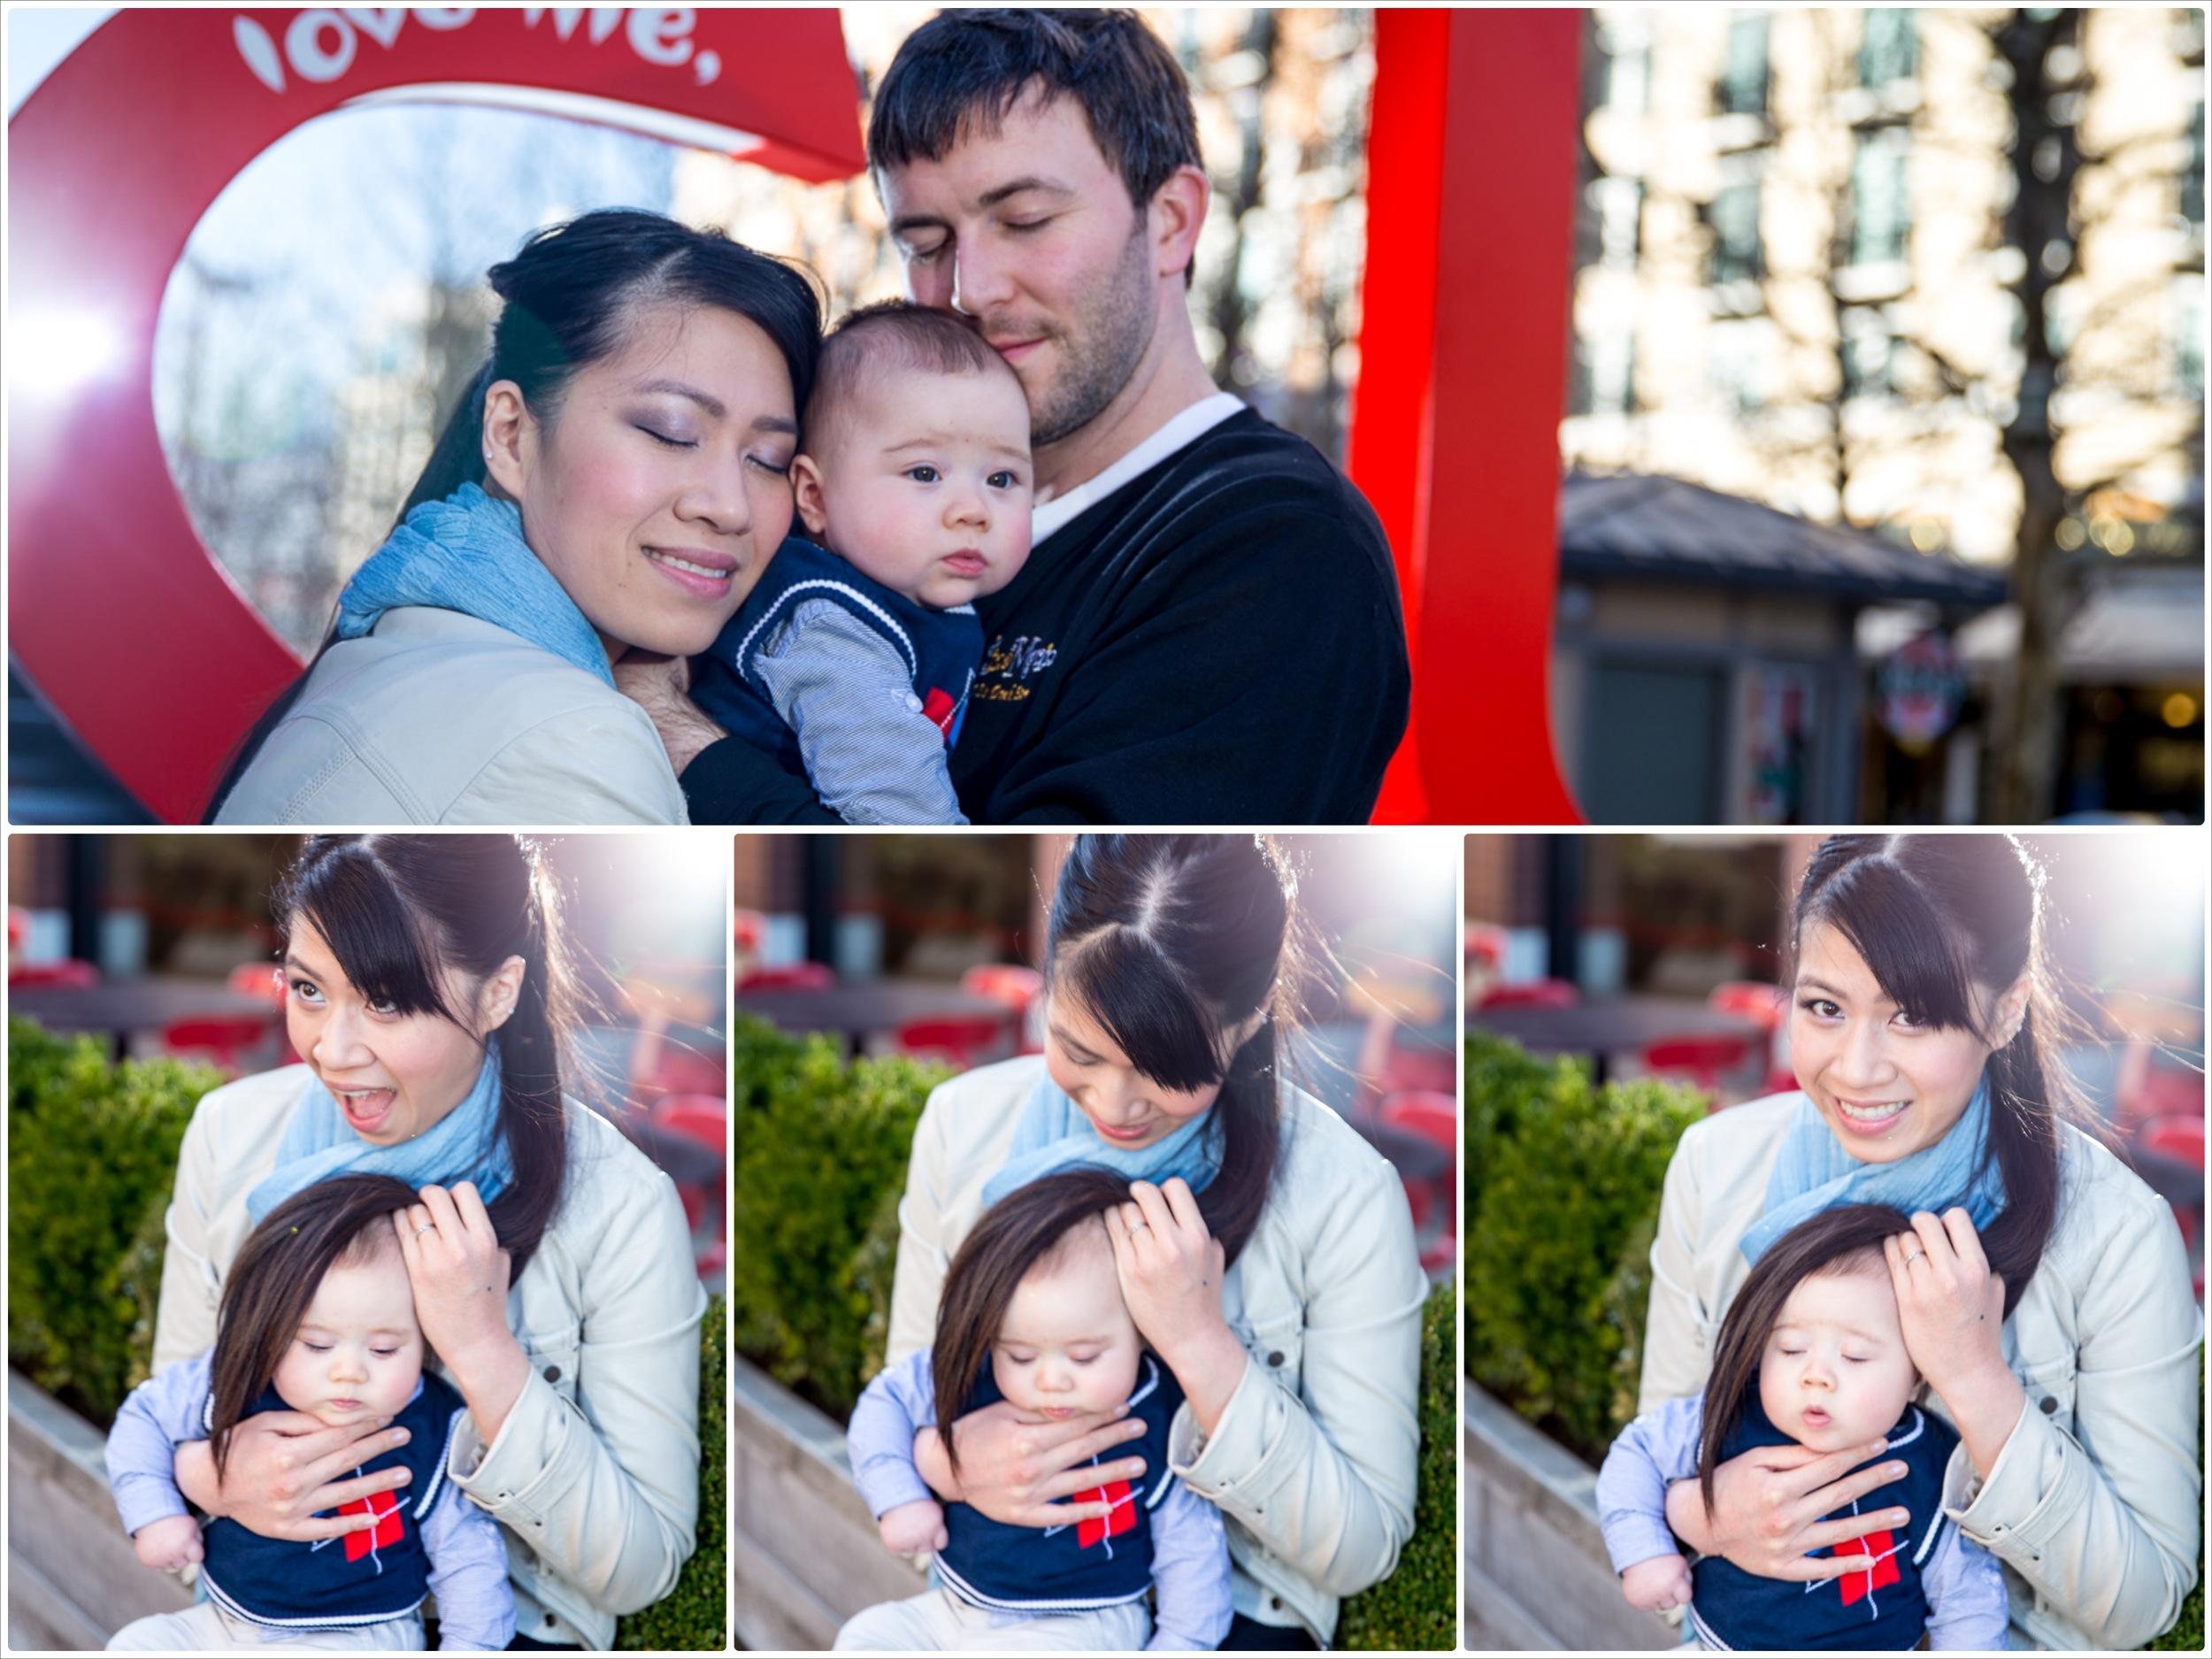 Blake-March-2014-Collage-1.jpg